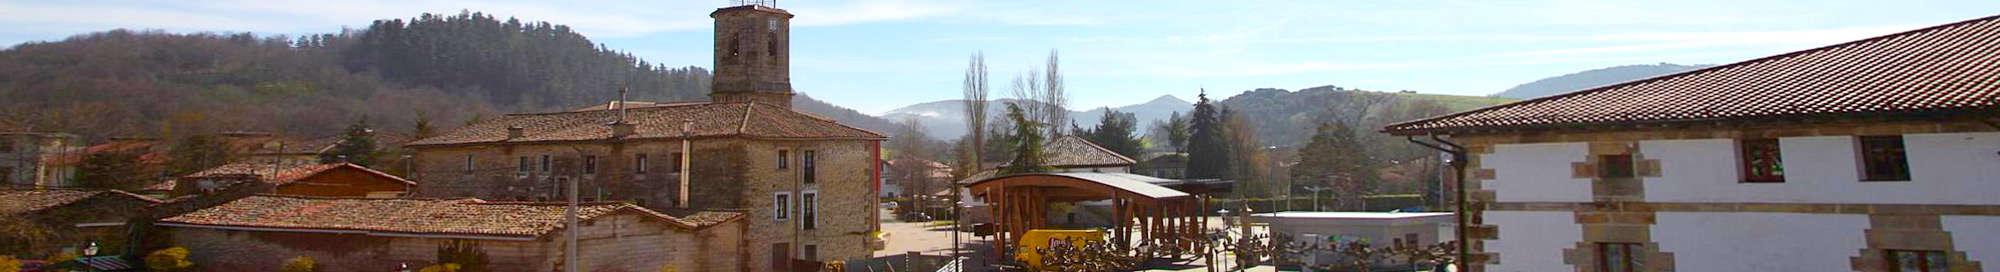 Week-end et séjour Murguía